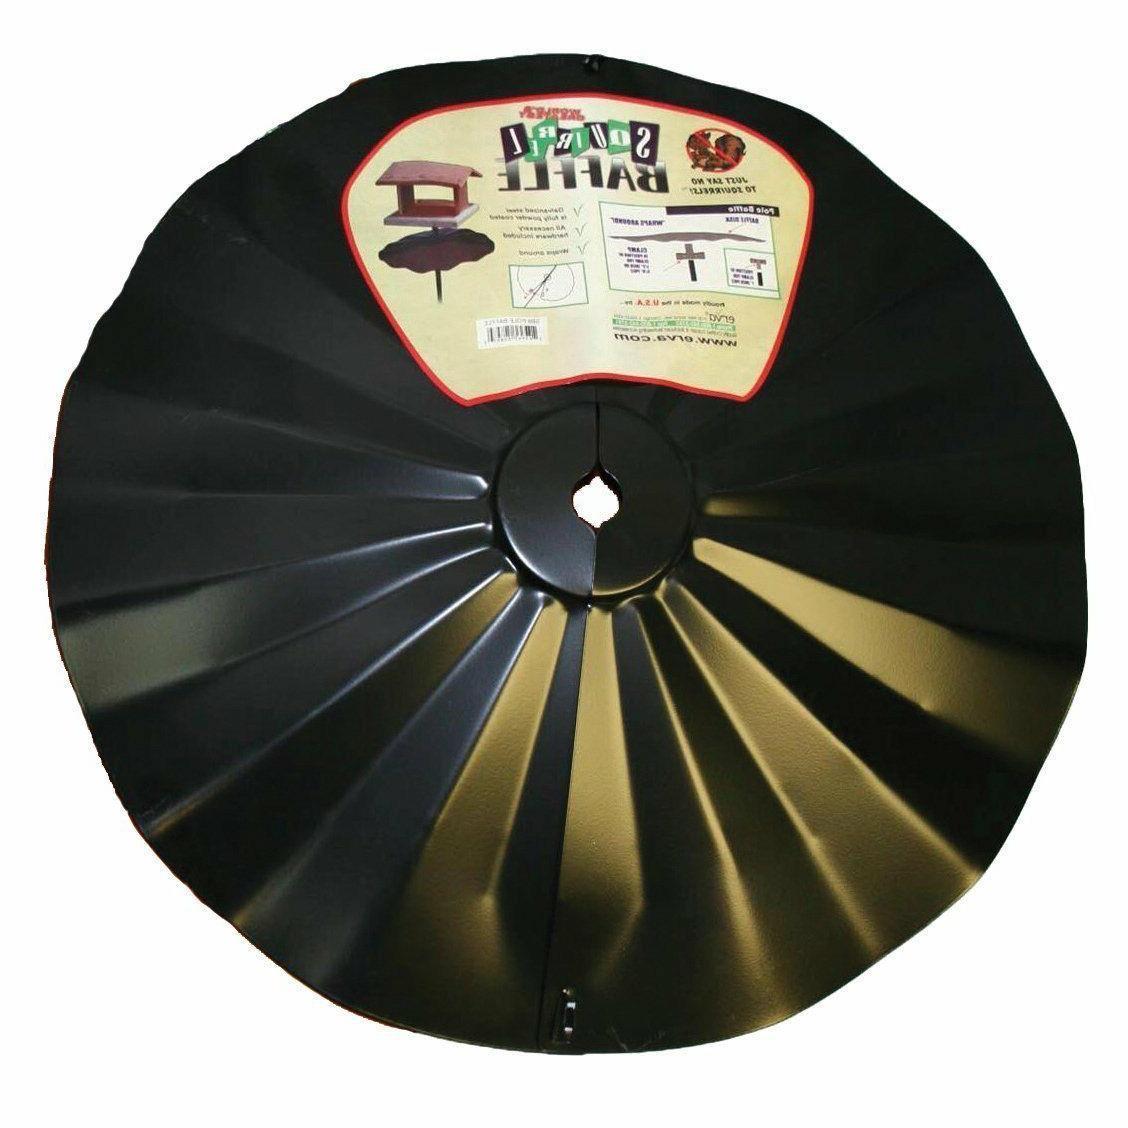 sb6 pole mount disk baffle